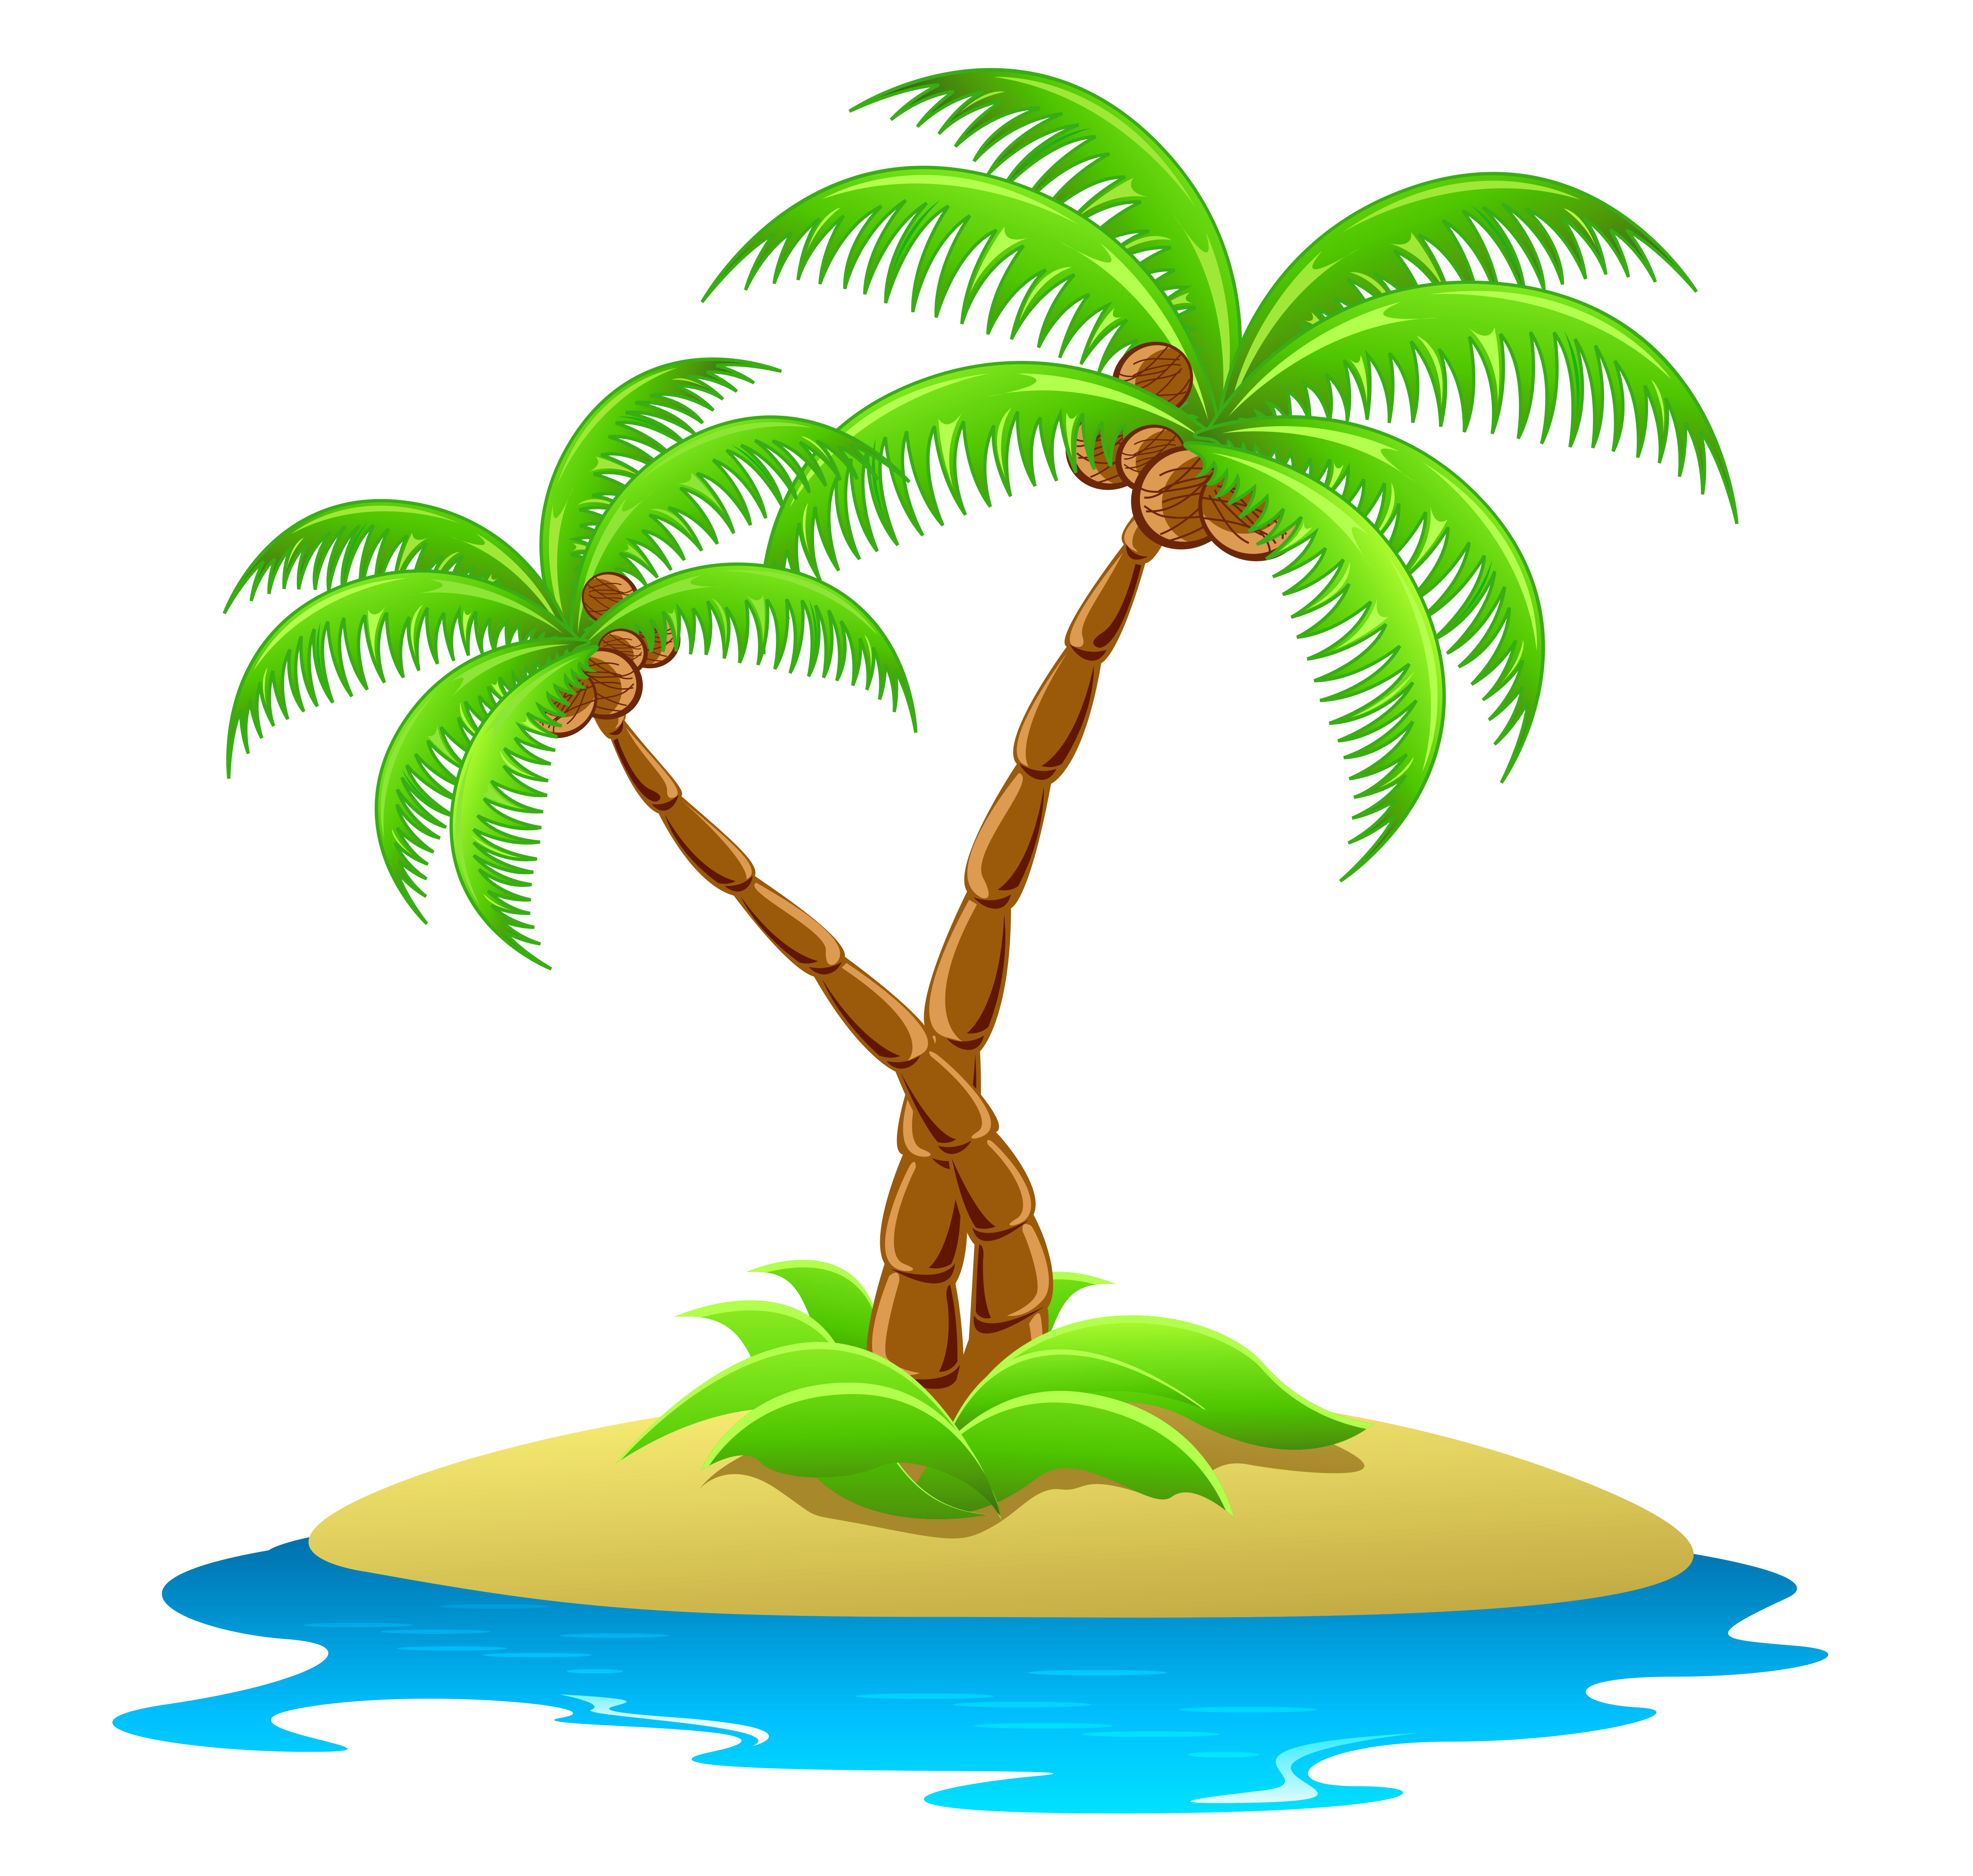 Island clipart #15